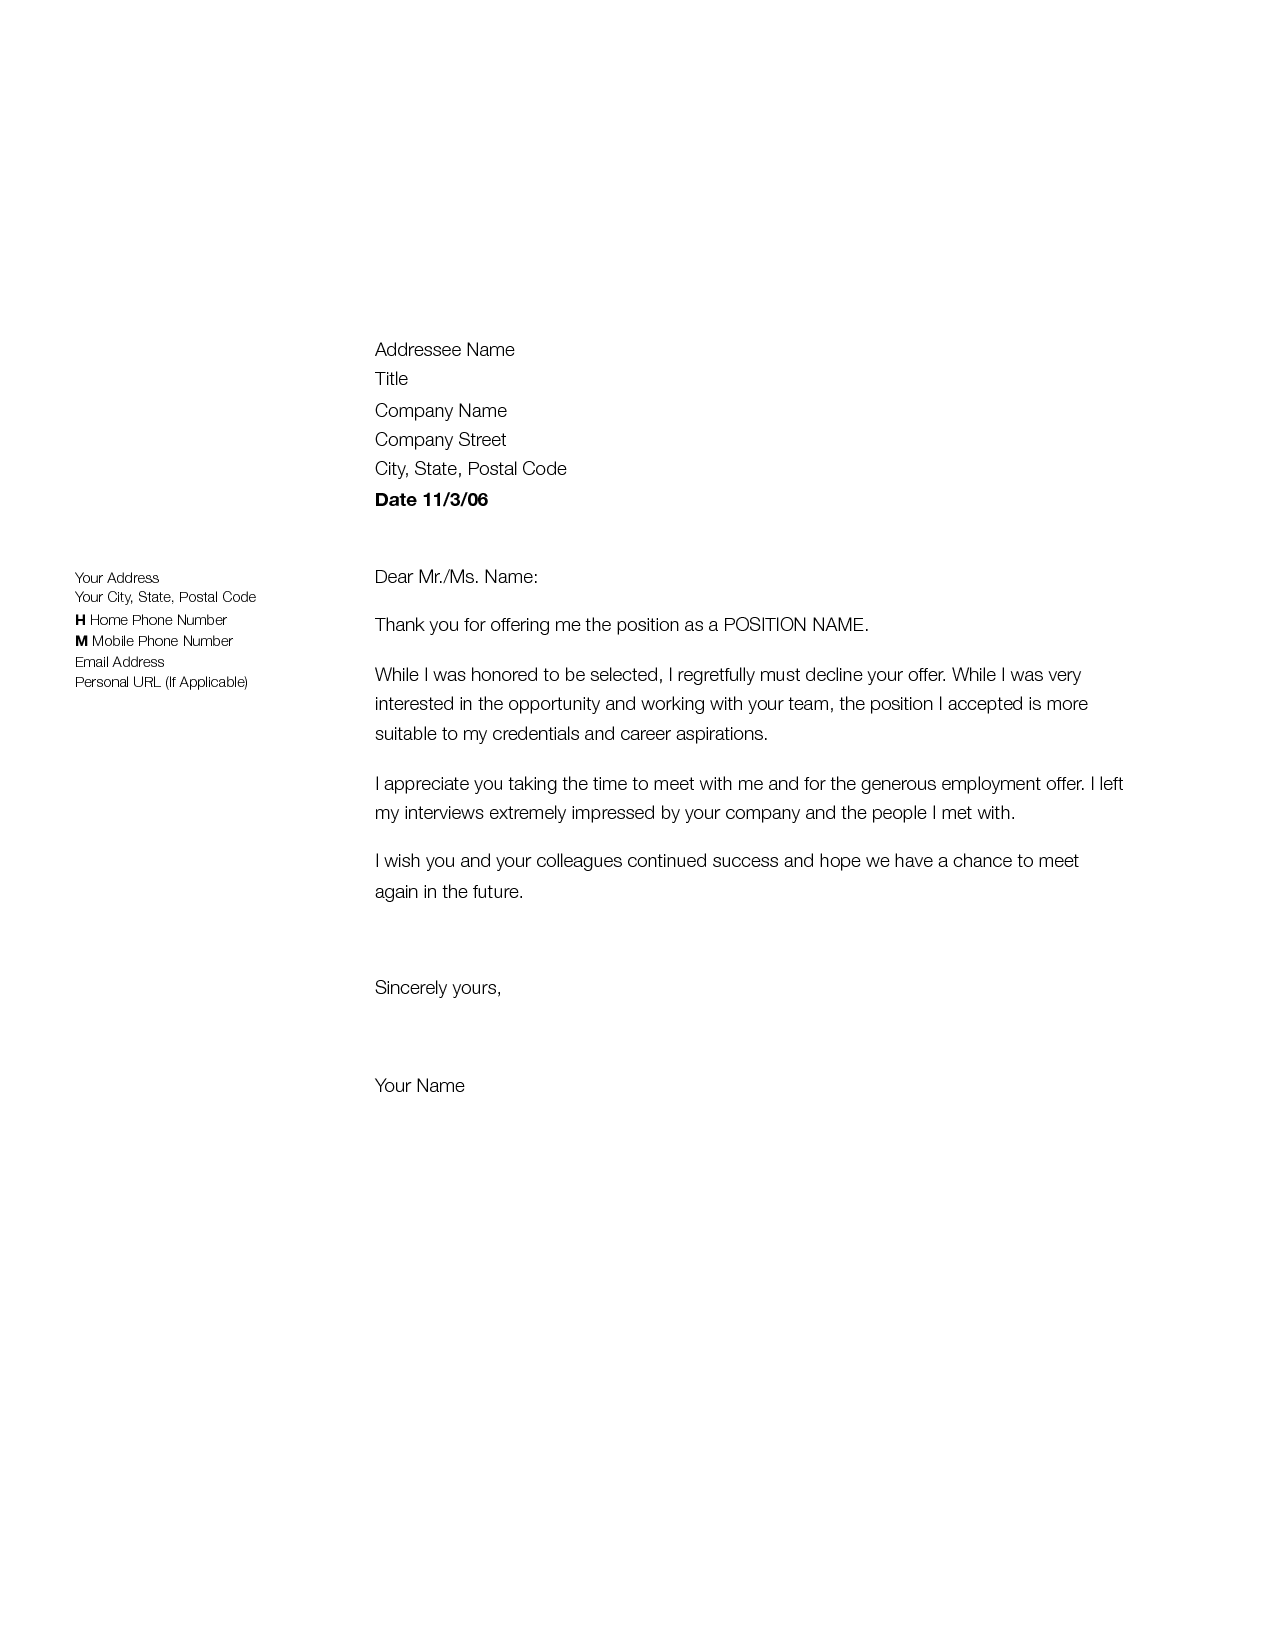 Job Offer Rejection Thank You Letter Sample Declining ...